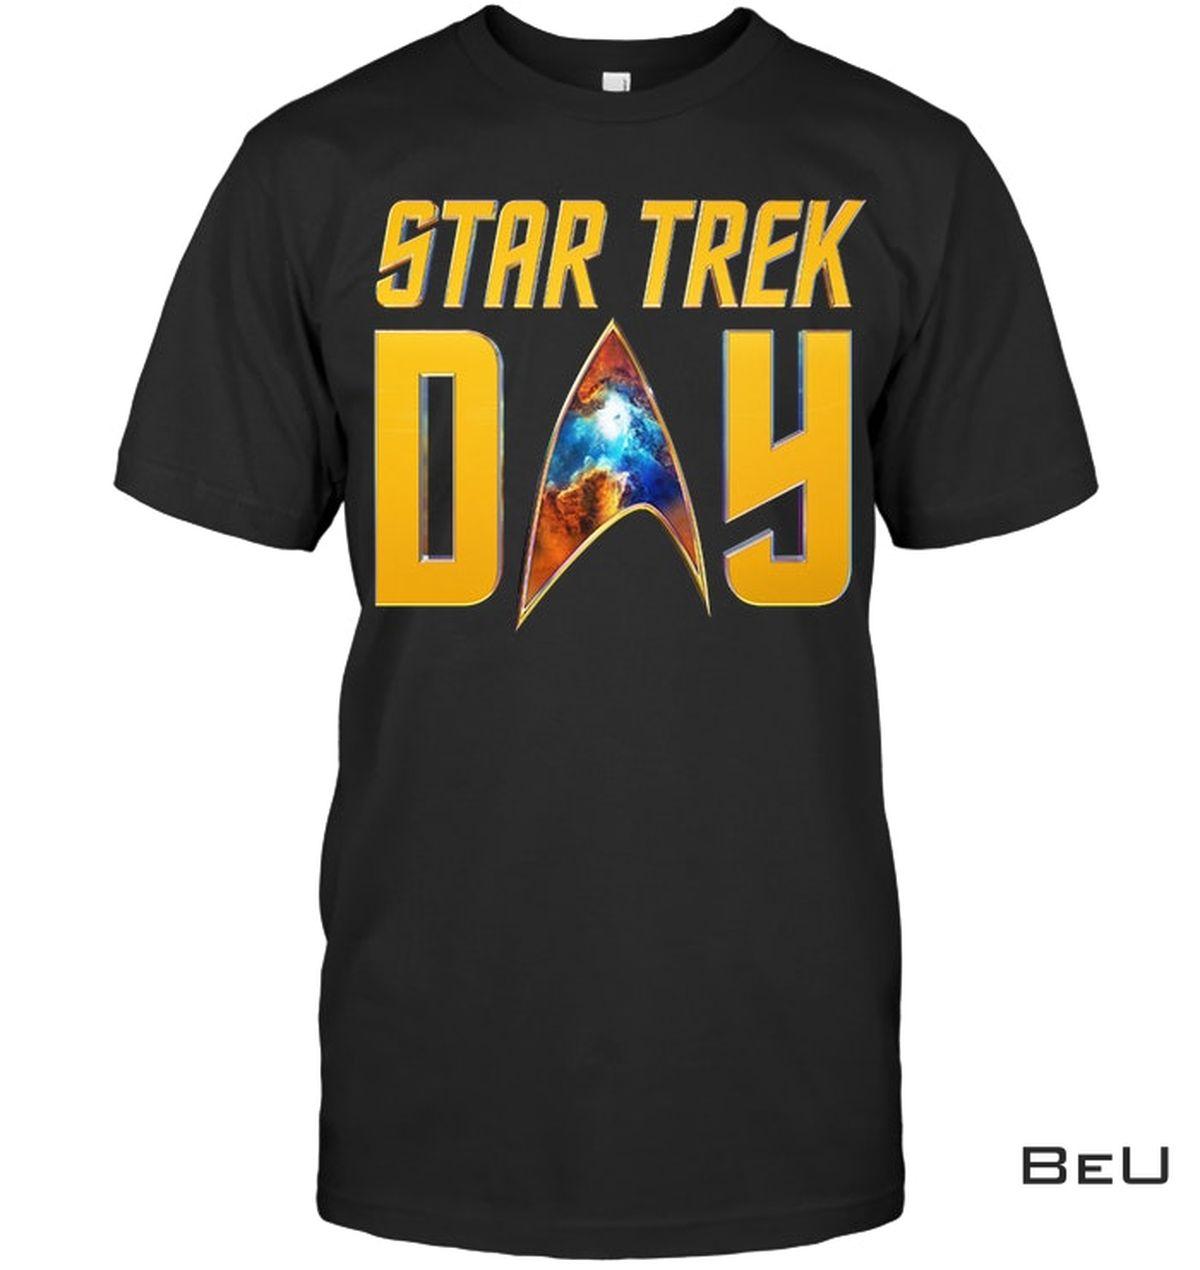 Star Trek Day Shirt, hoodie, tank top